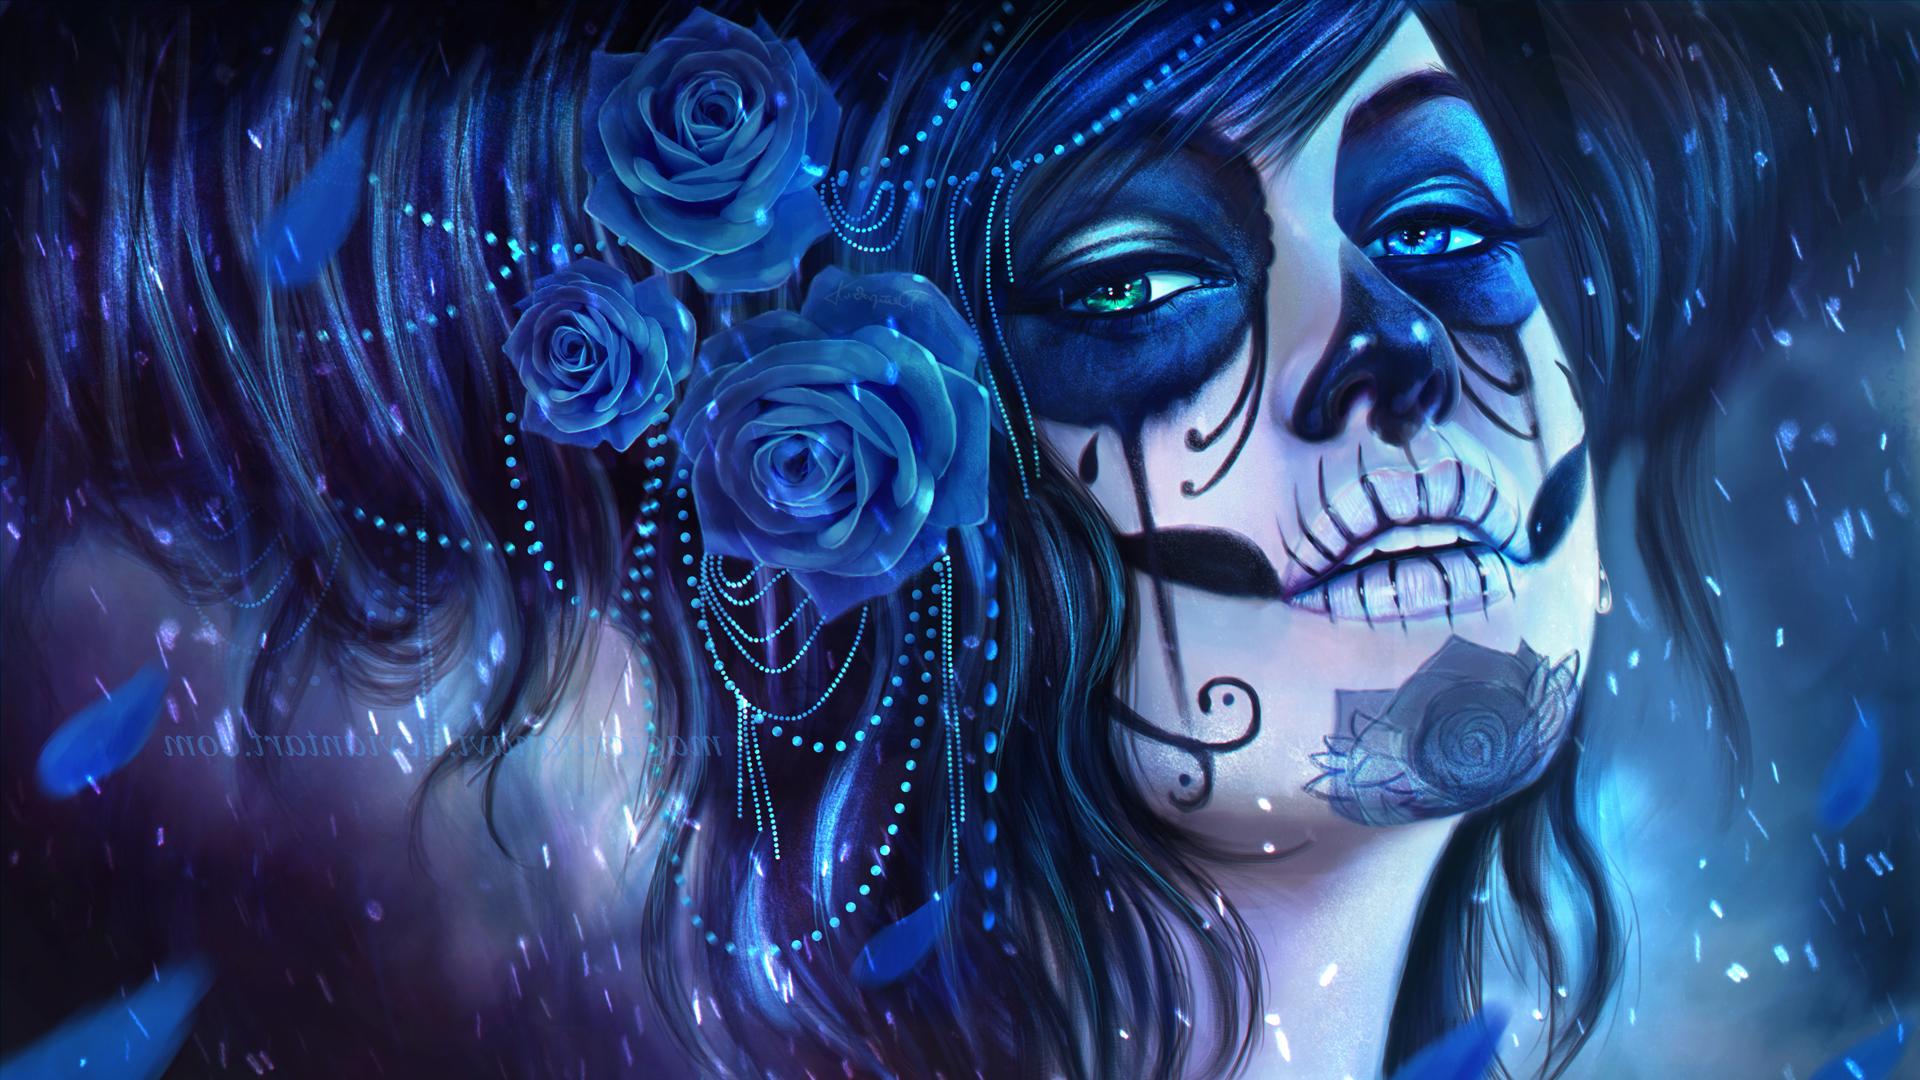 1920x1080 Px Artwork Blue Flowers MagicnaAnavi Rose Sugar Skull